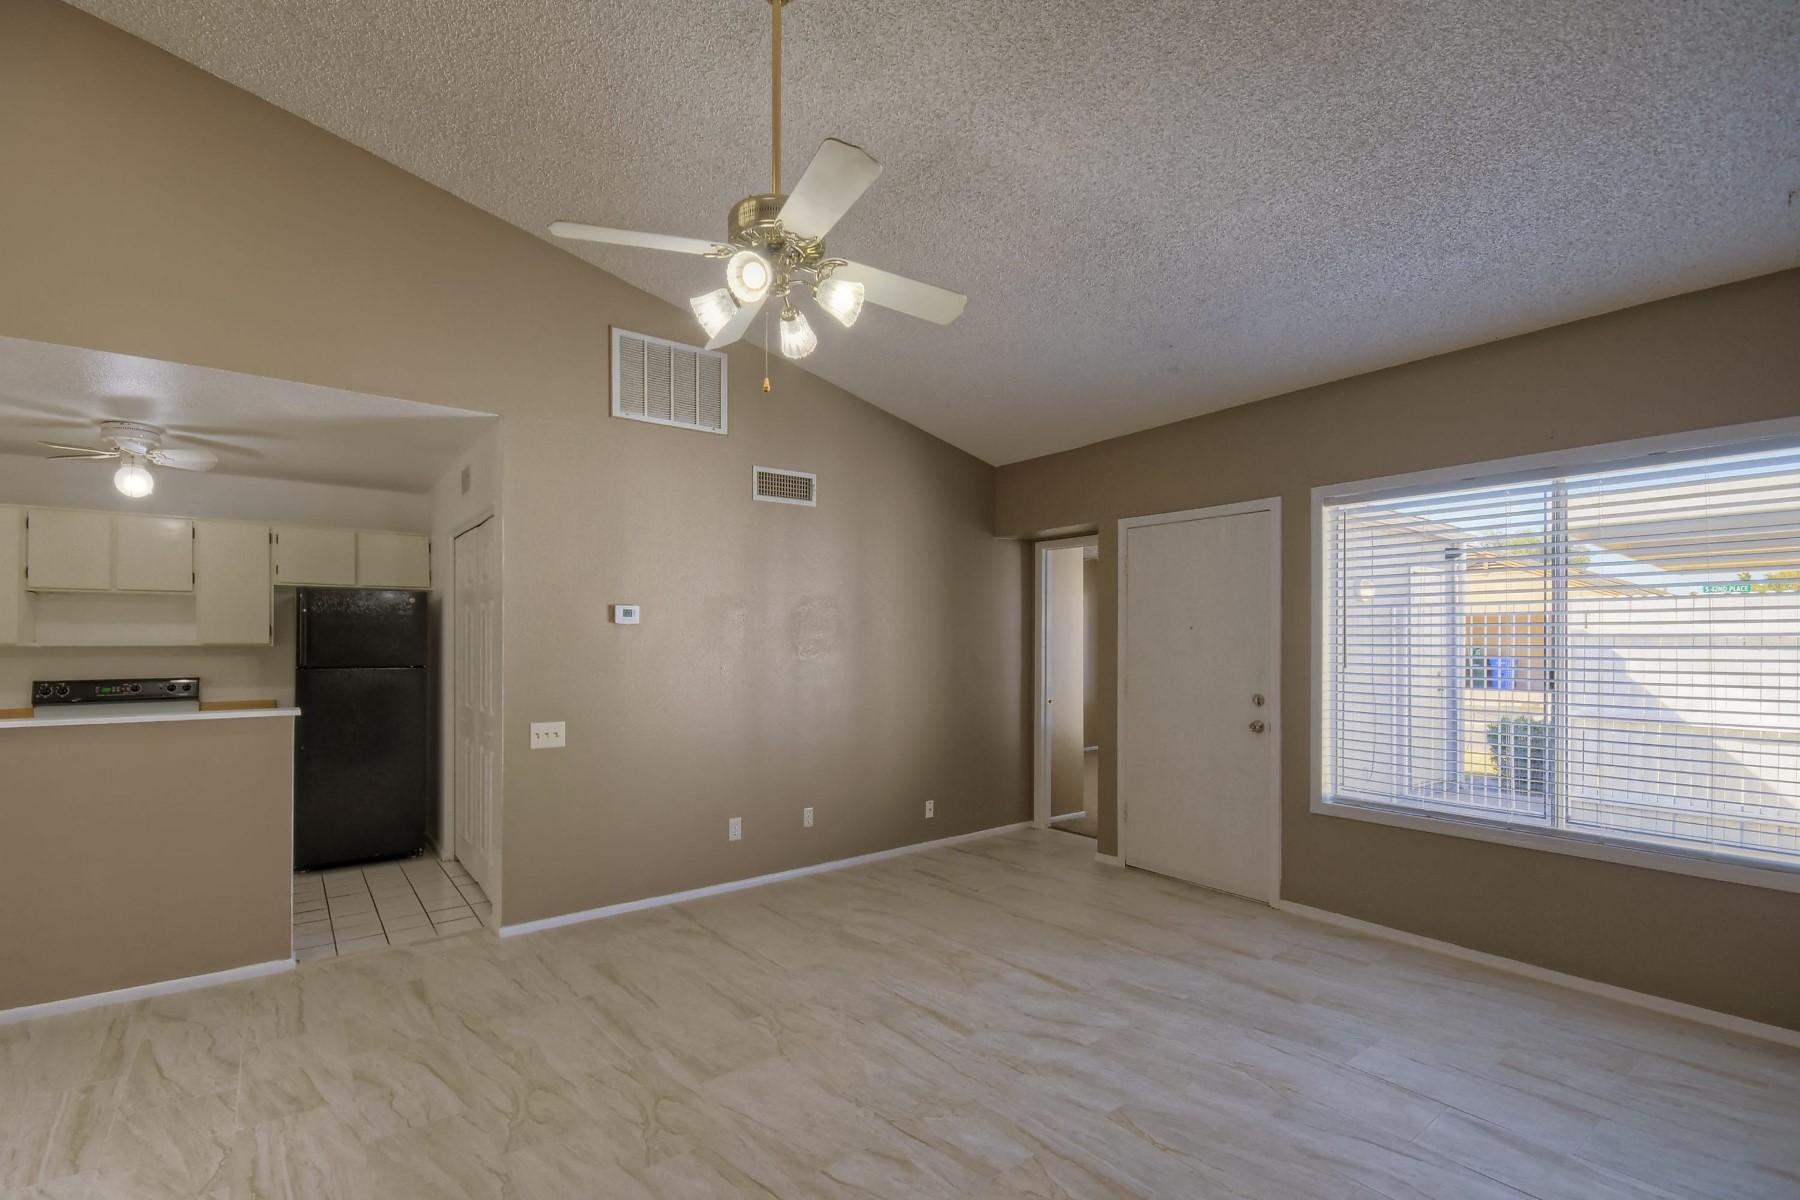 Casa unifamiliar adosada (Townhouse) por un Alquiler en Beautifully remodeled Town home in Phoenix 7009 S 42nd Pl, Phoenix, Arizona, 85042 Estados Unidos